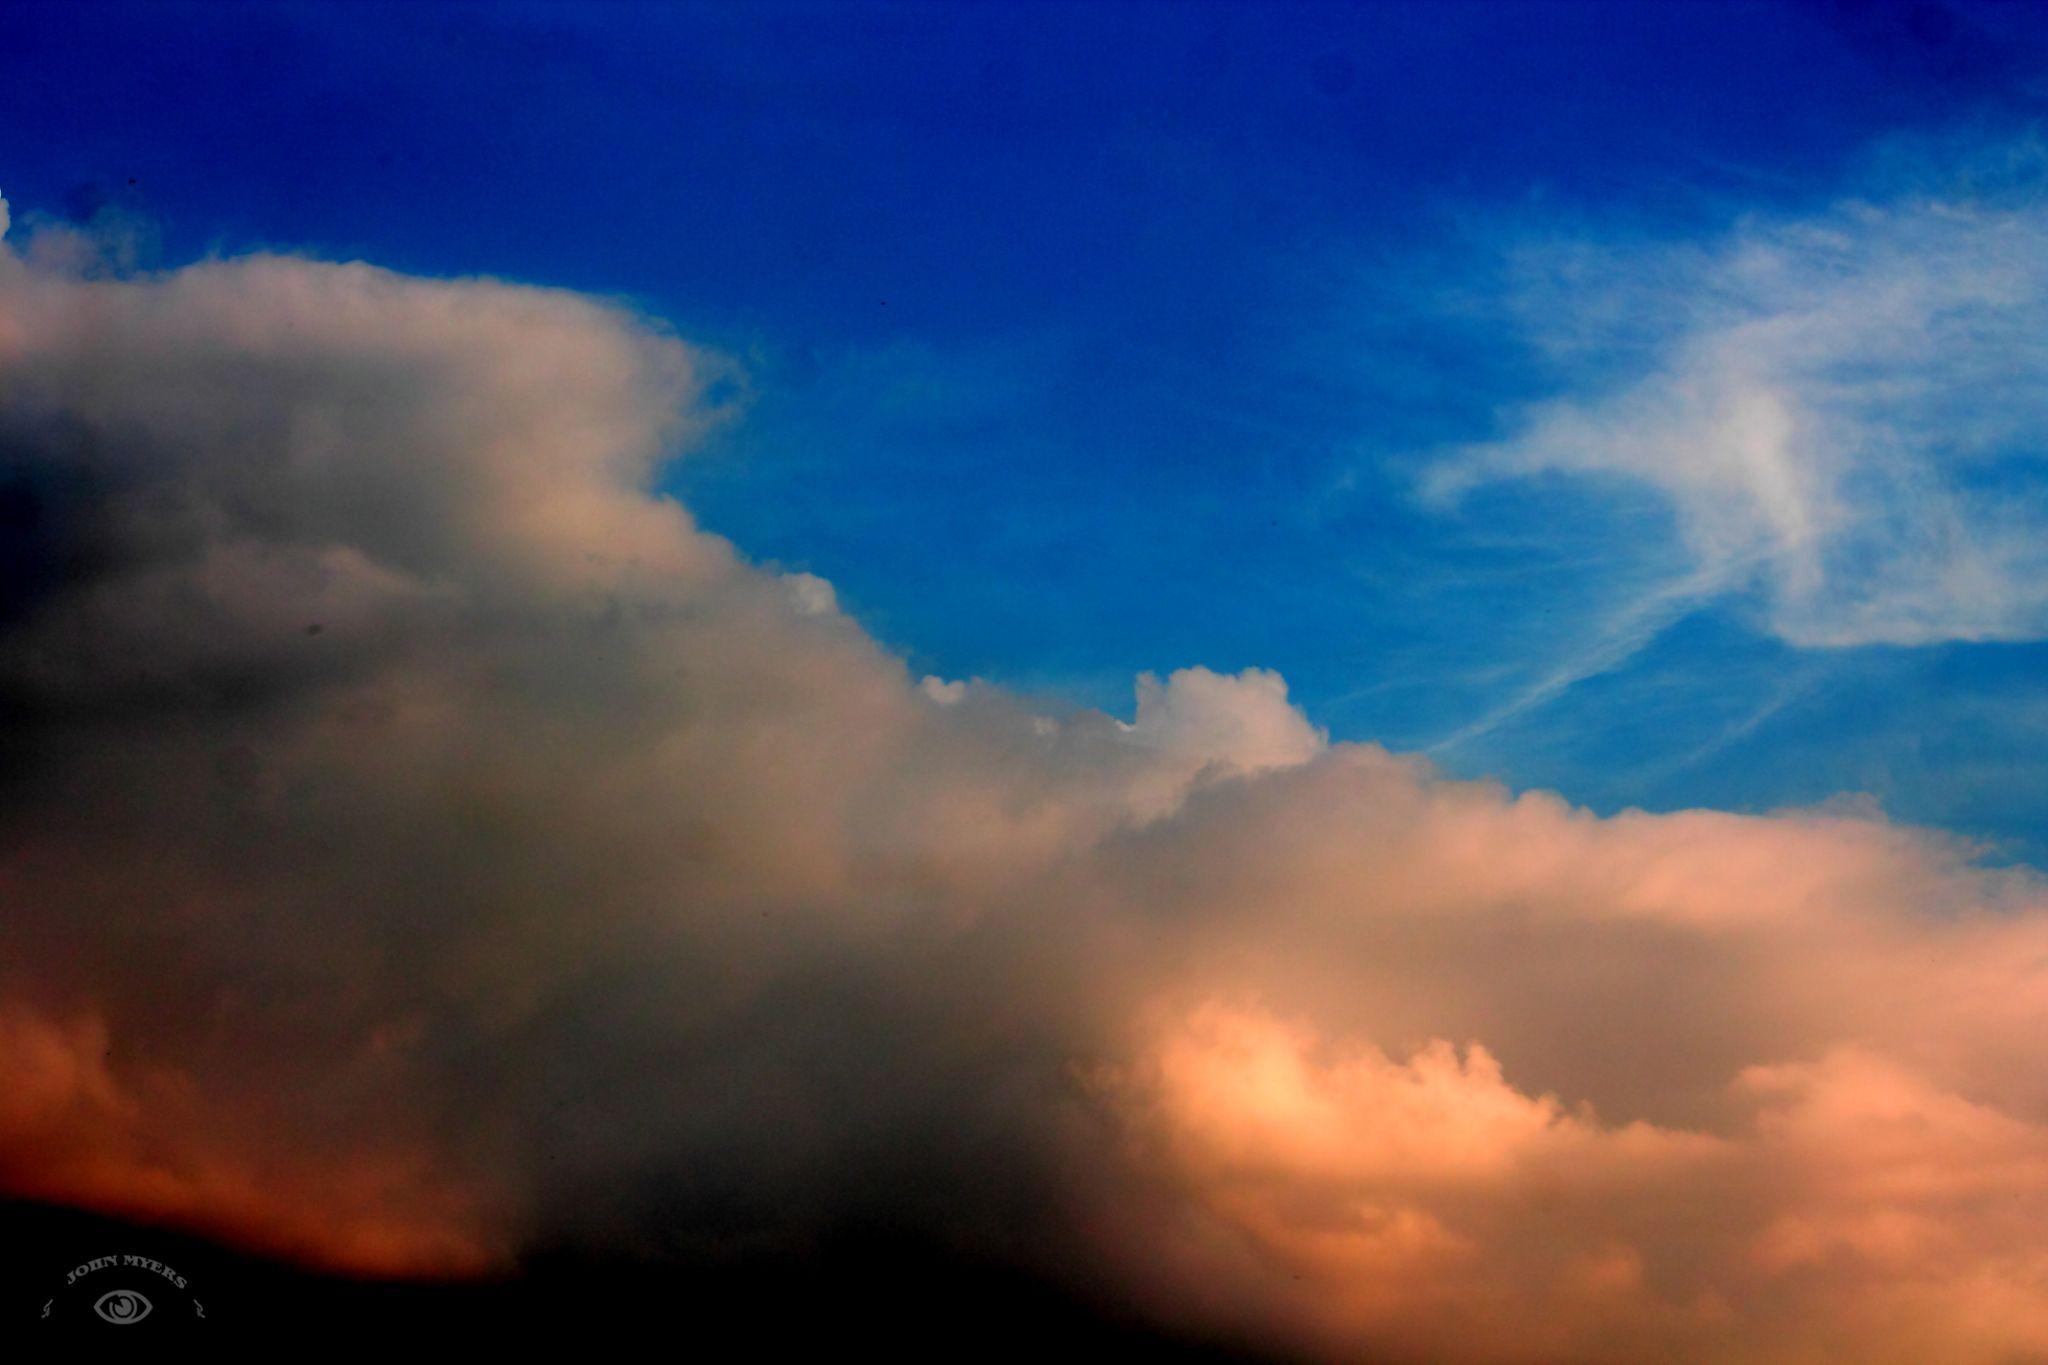 27.09.14  Clouds_b by John T. Myers III